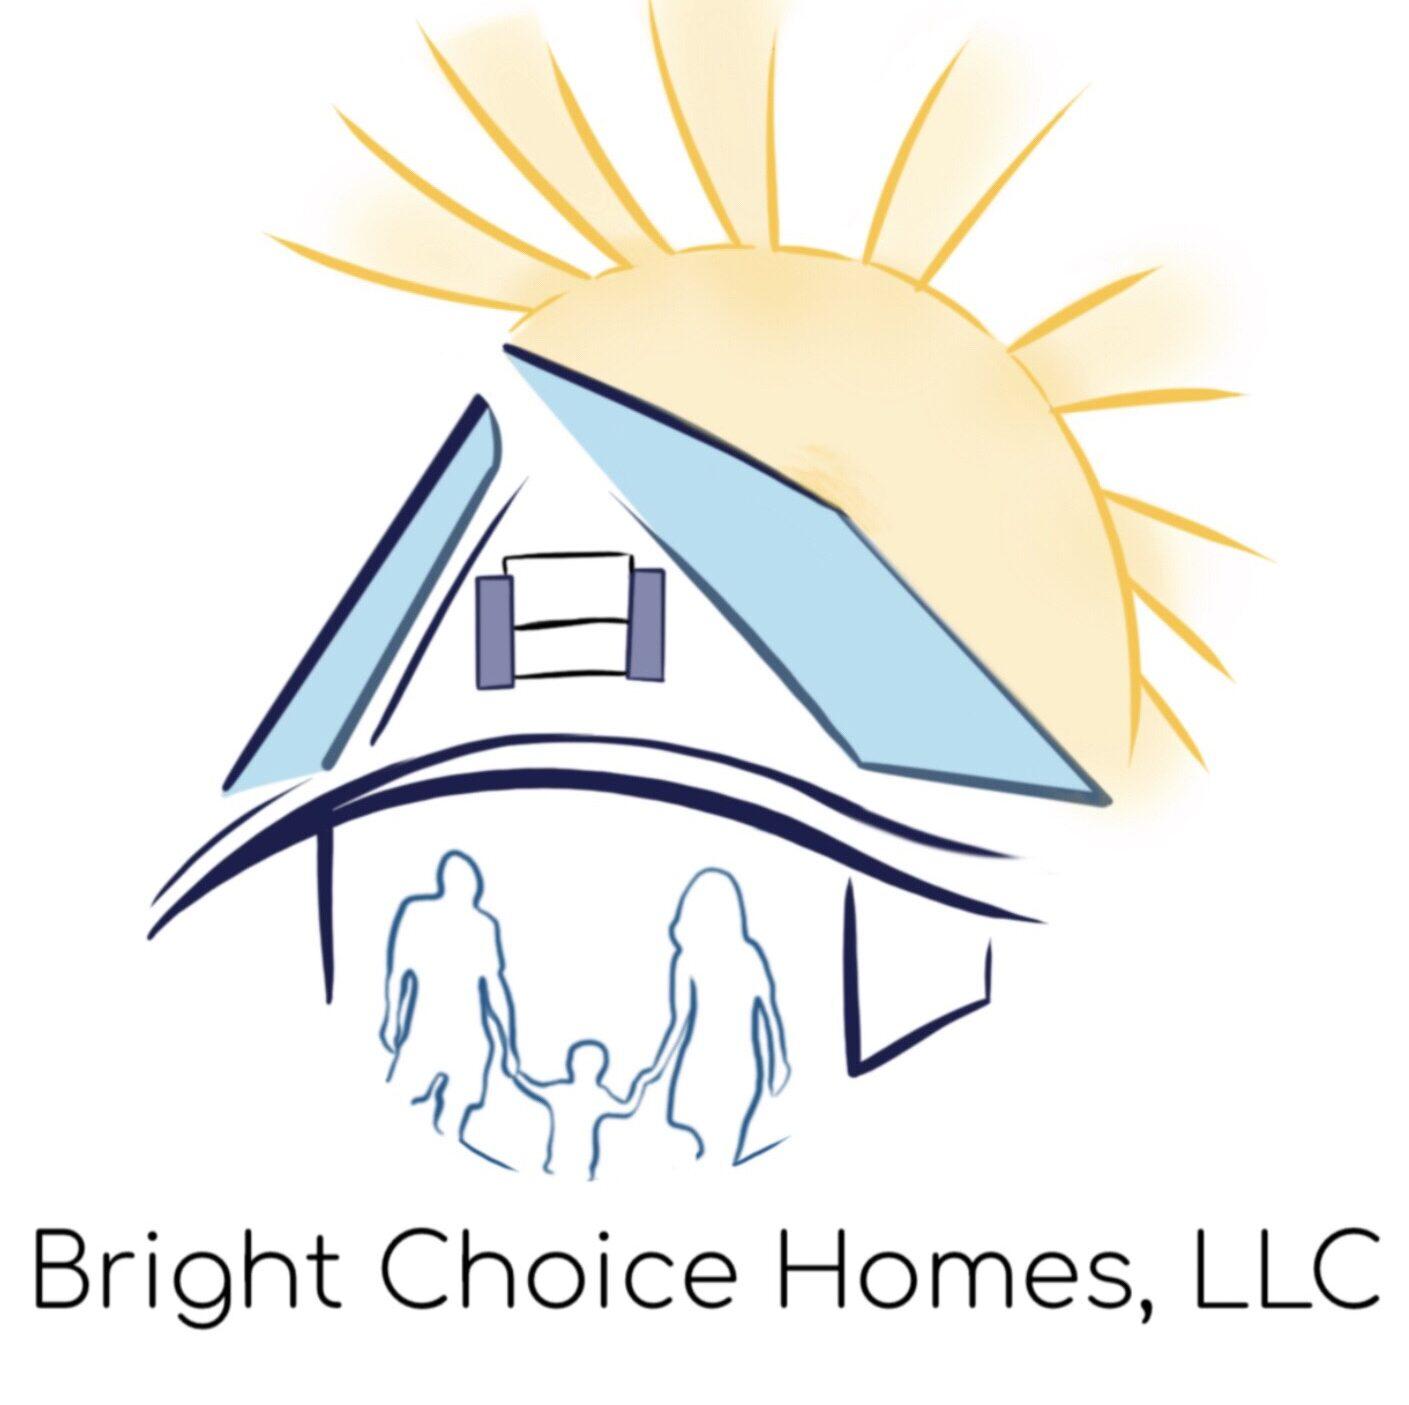 Bright Choice Homes LLC